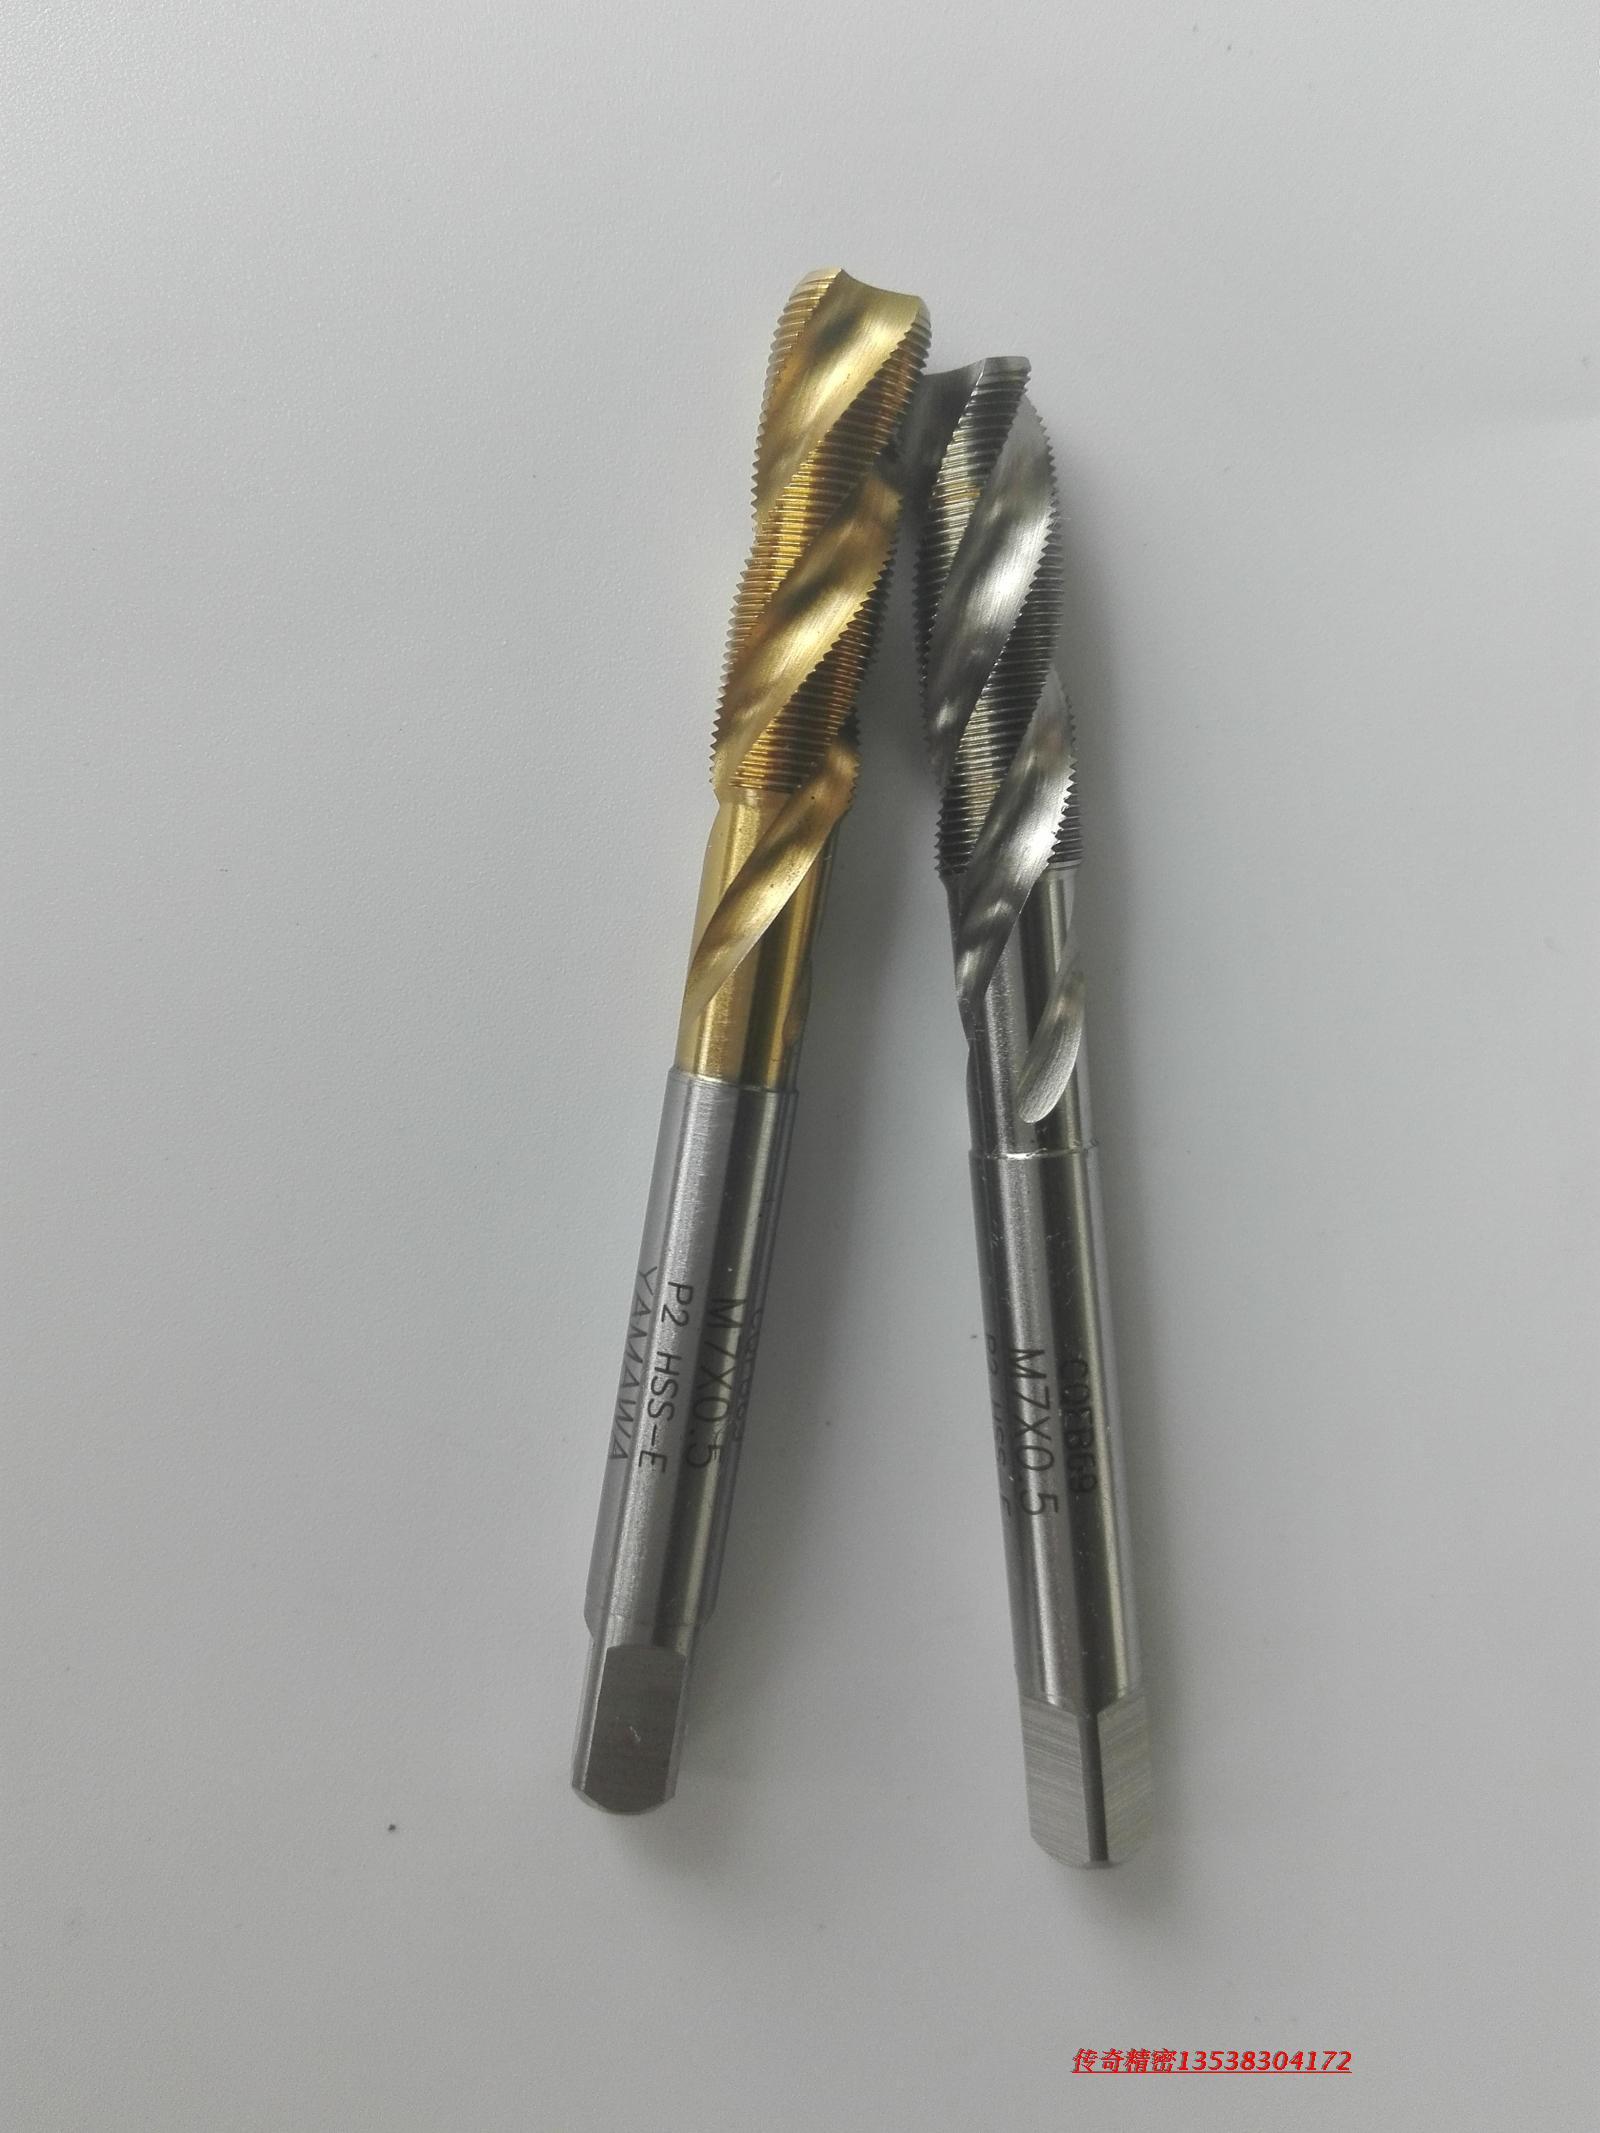 Japan YAMAWA Ti / white spiral tap M7X0.5 metric fine thread X0.75X1 on chip screw tap